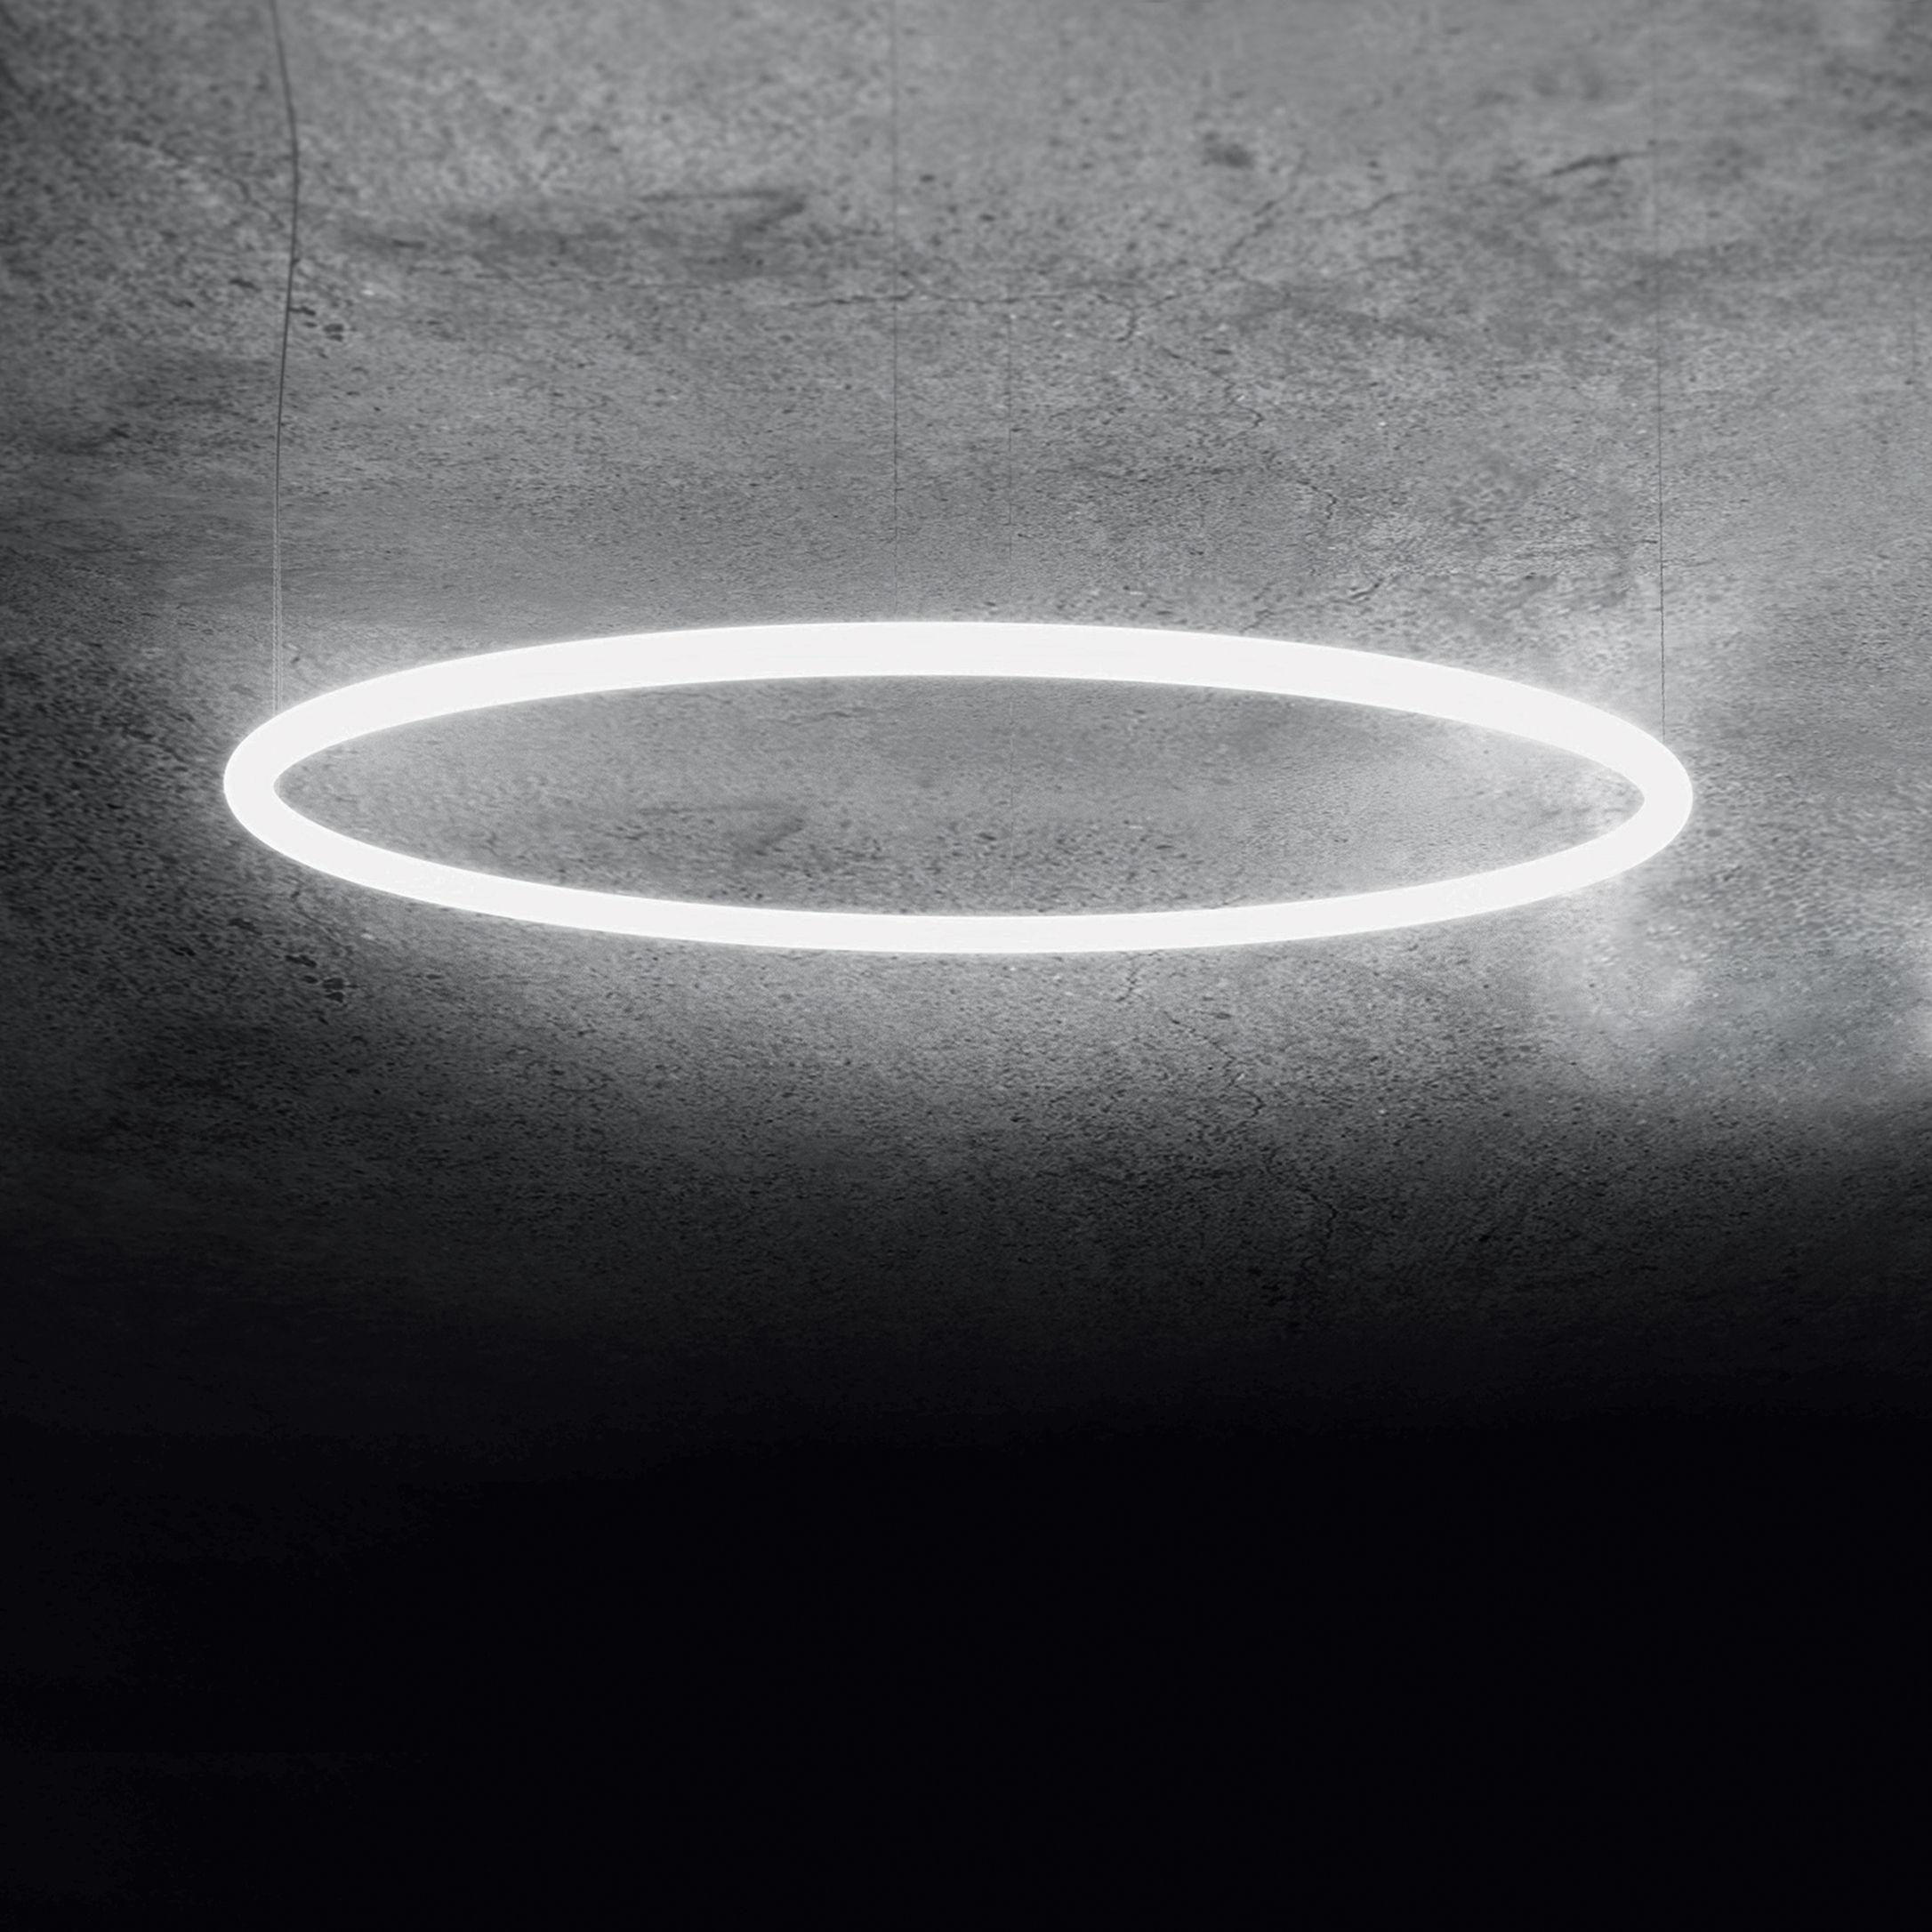 Luminaire - Suspensions - Suspension Alphabet of light / Ø 90 cm - Artemide - Ø 90 cm / Blanc - Aluminium, Méthacrylate